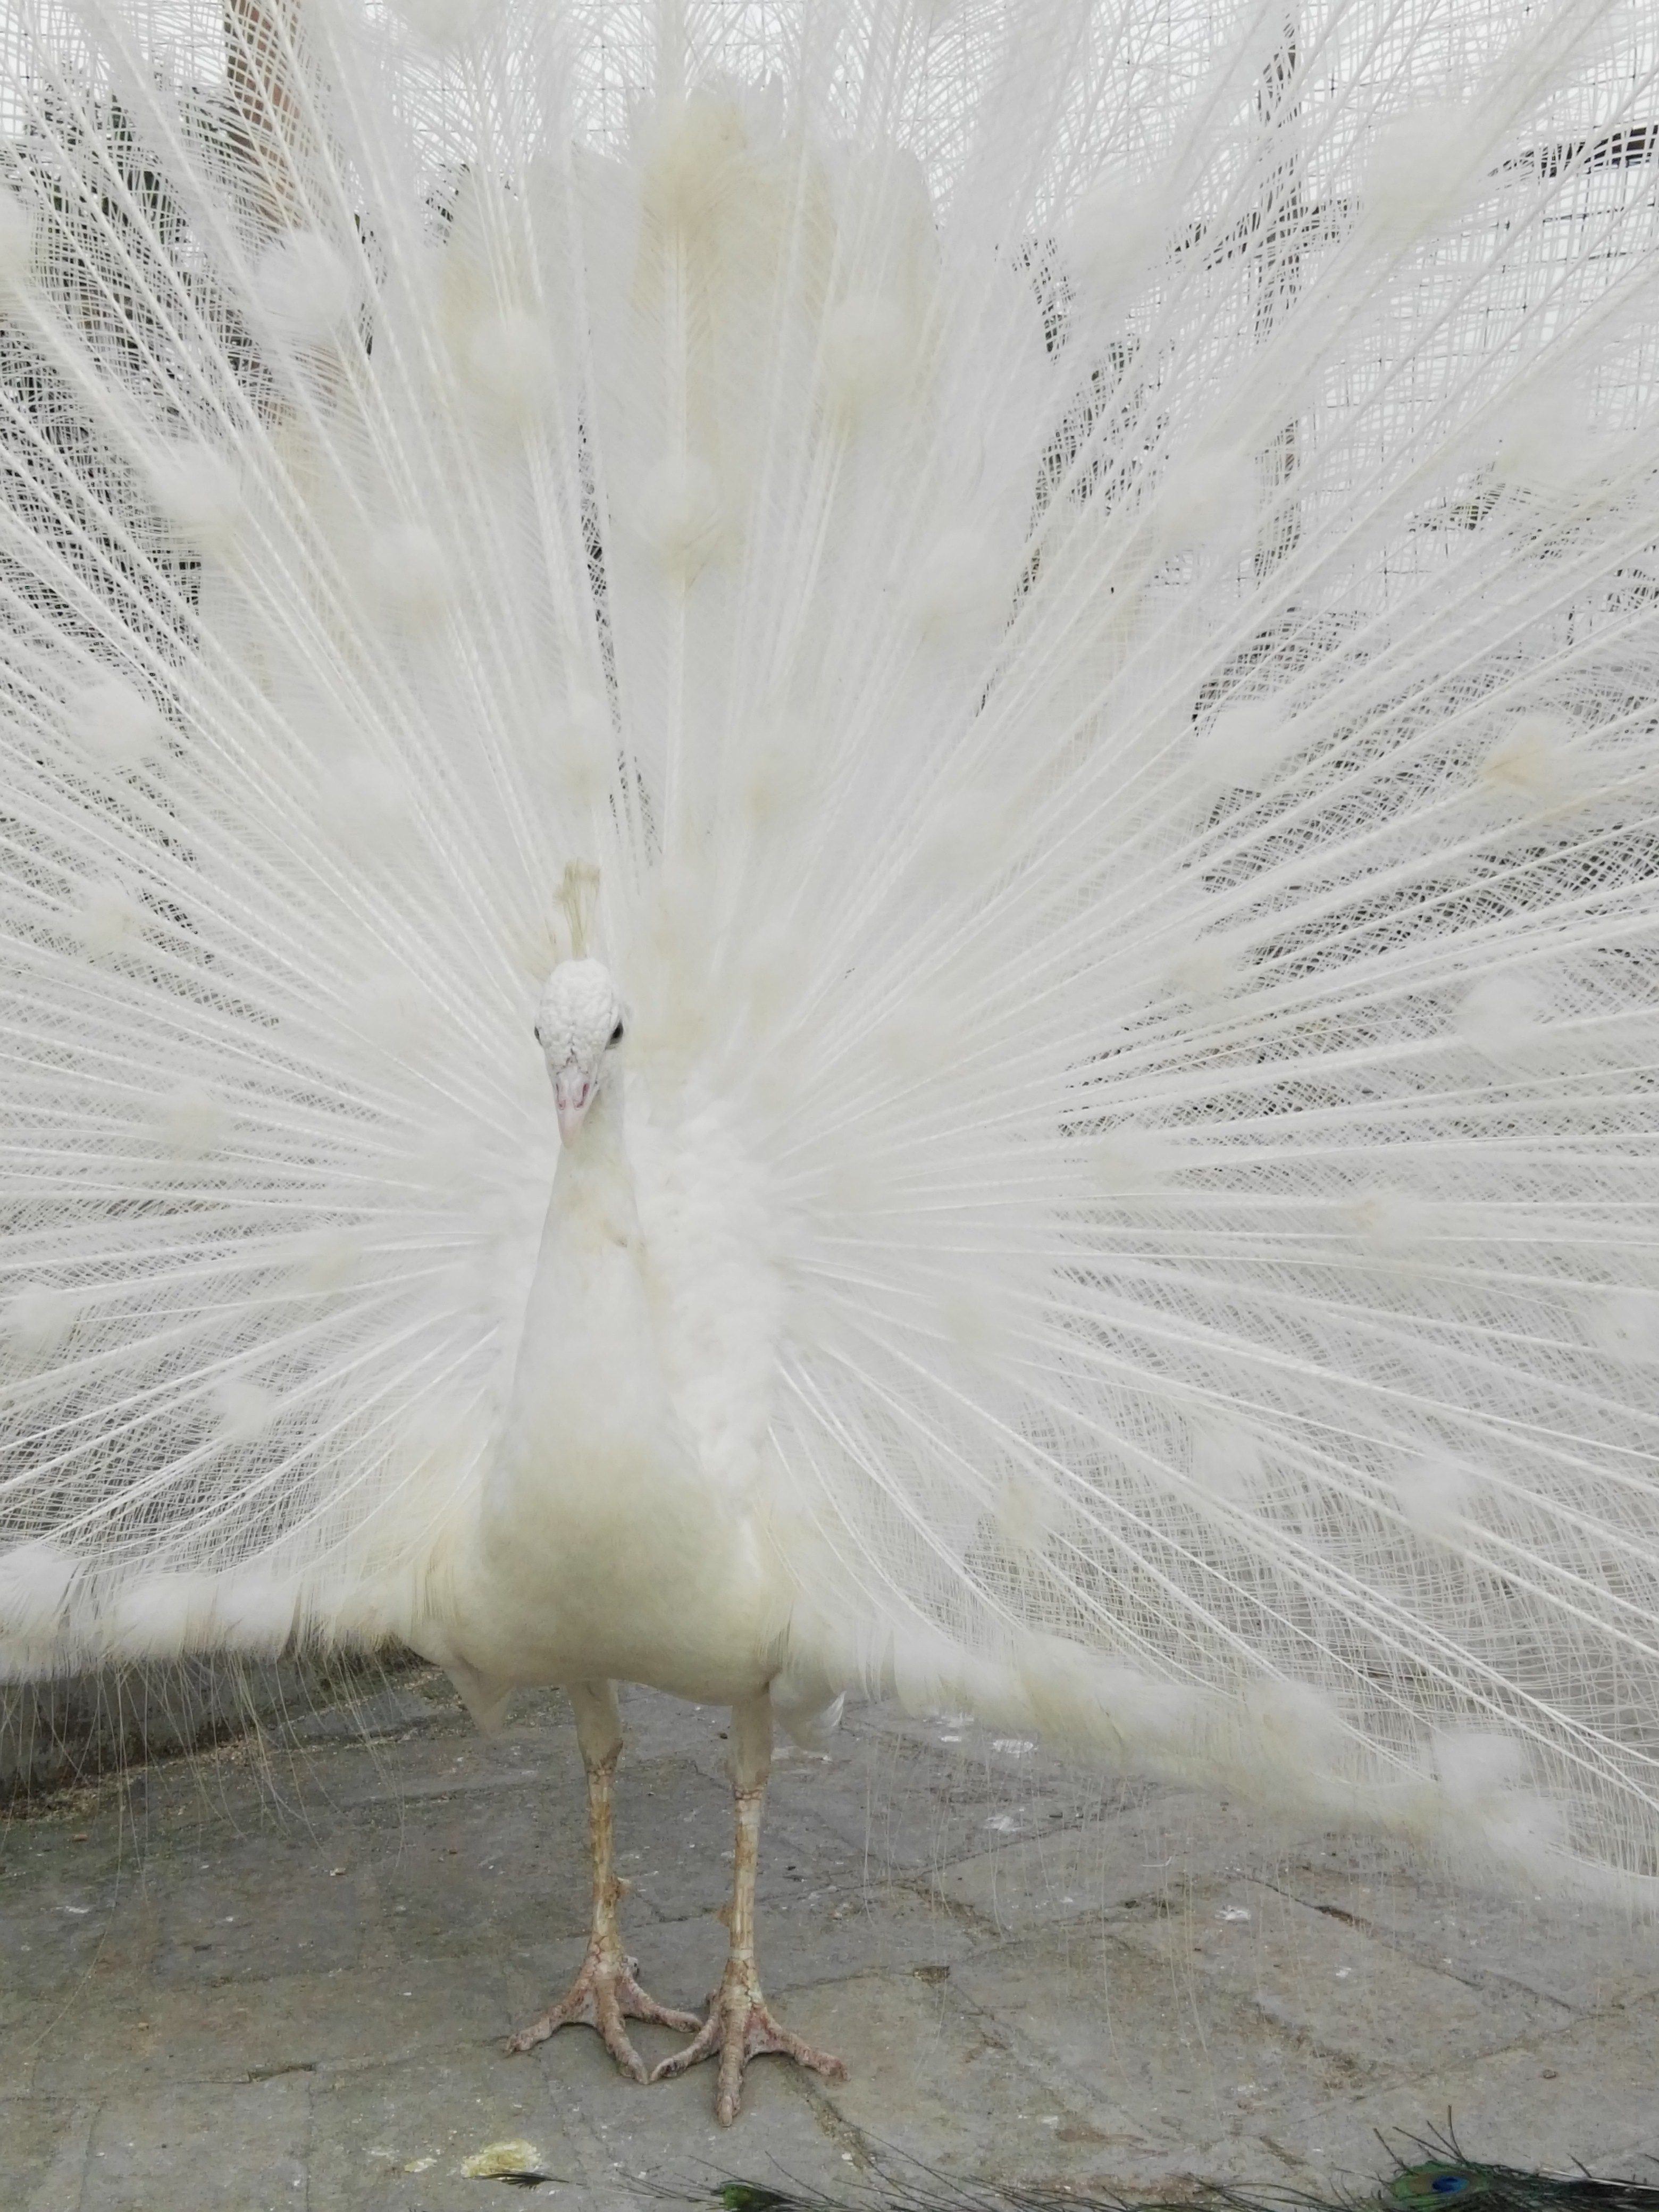 中国孔雀供应商供应种孔雀,白孔雀,花孔雀,蓝孔雀,观赏孔雀